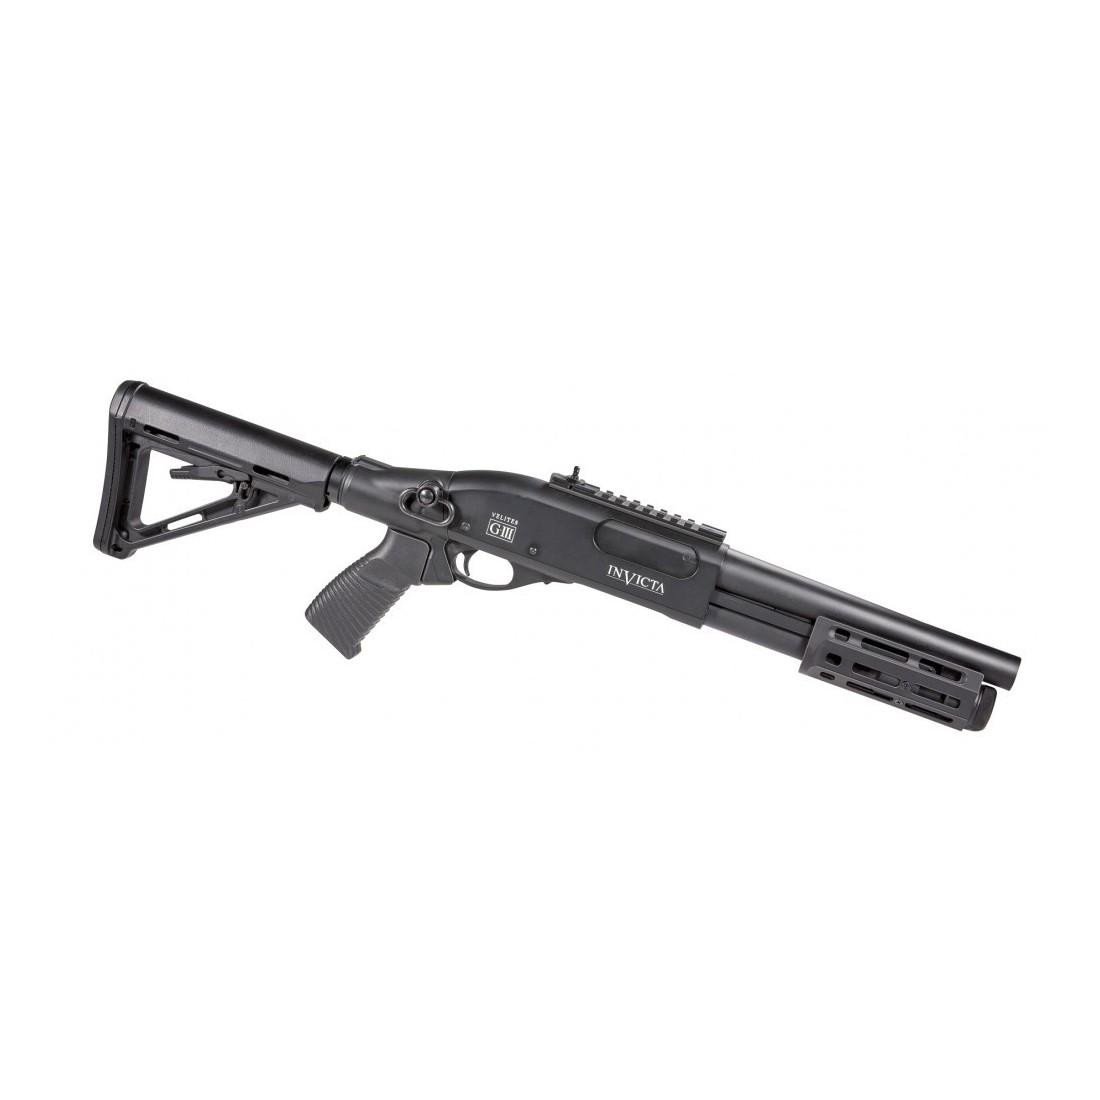 Shotgun VELITES INVICTA G-III black [SECUTOR]